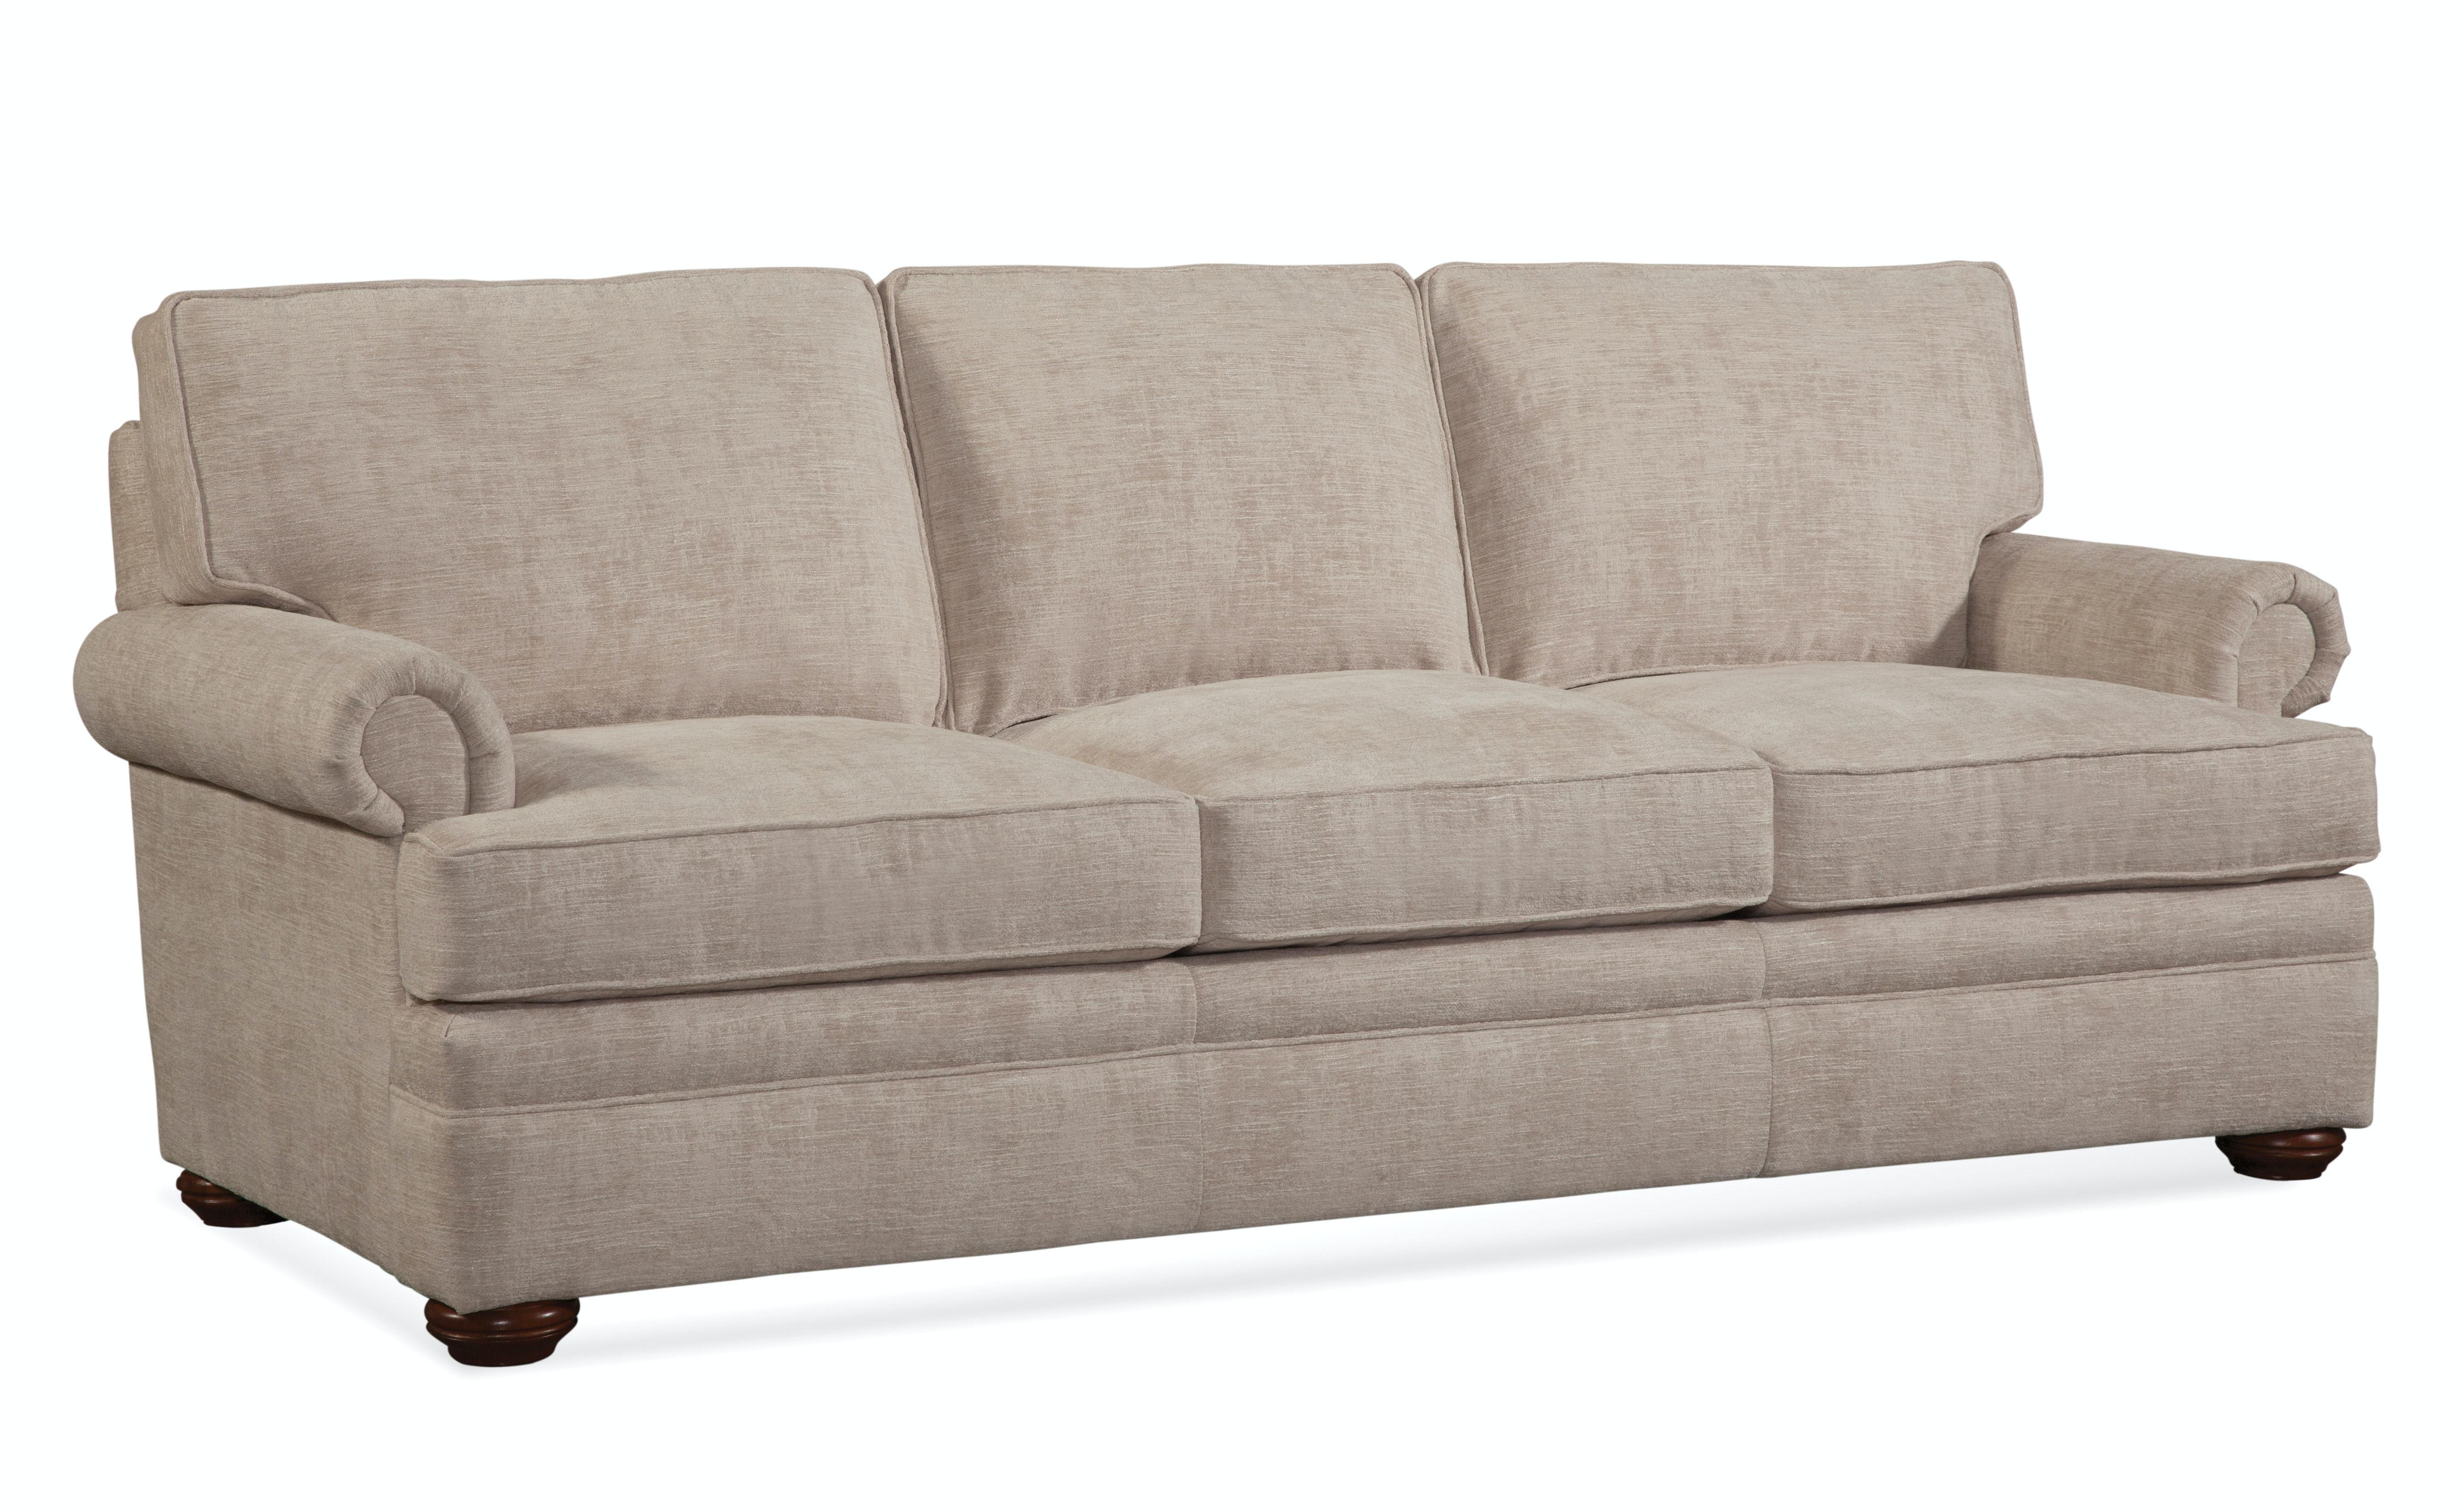 Merveilleux Braxton Culler Sofa 7111 011